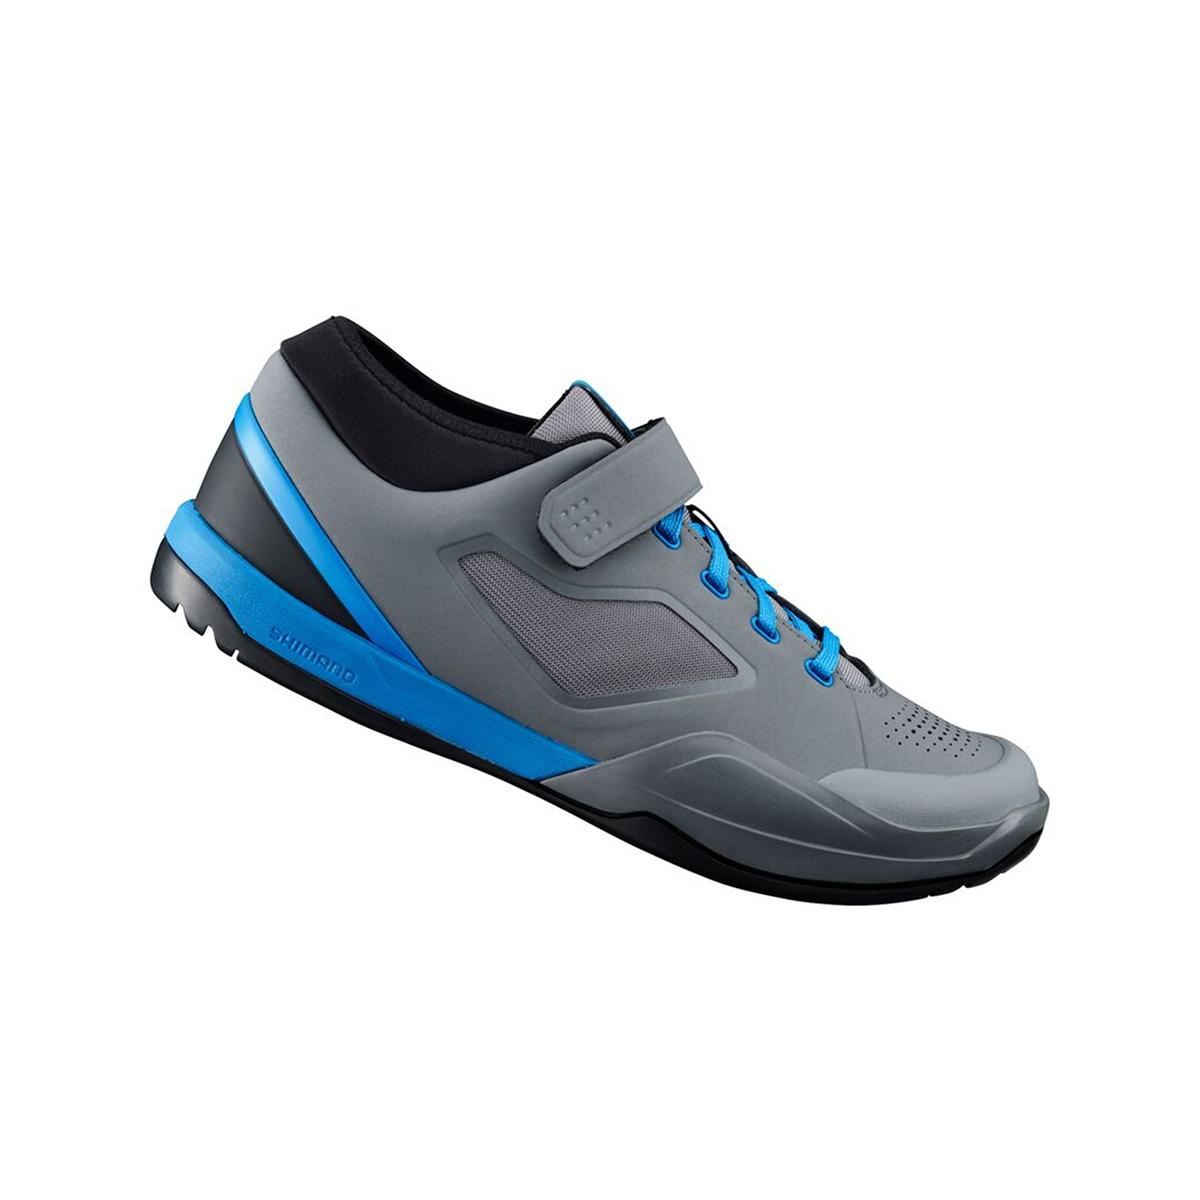 Shimano (AM7) SPD MTB Shoe